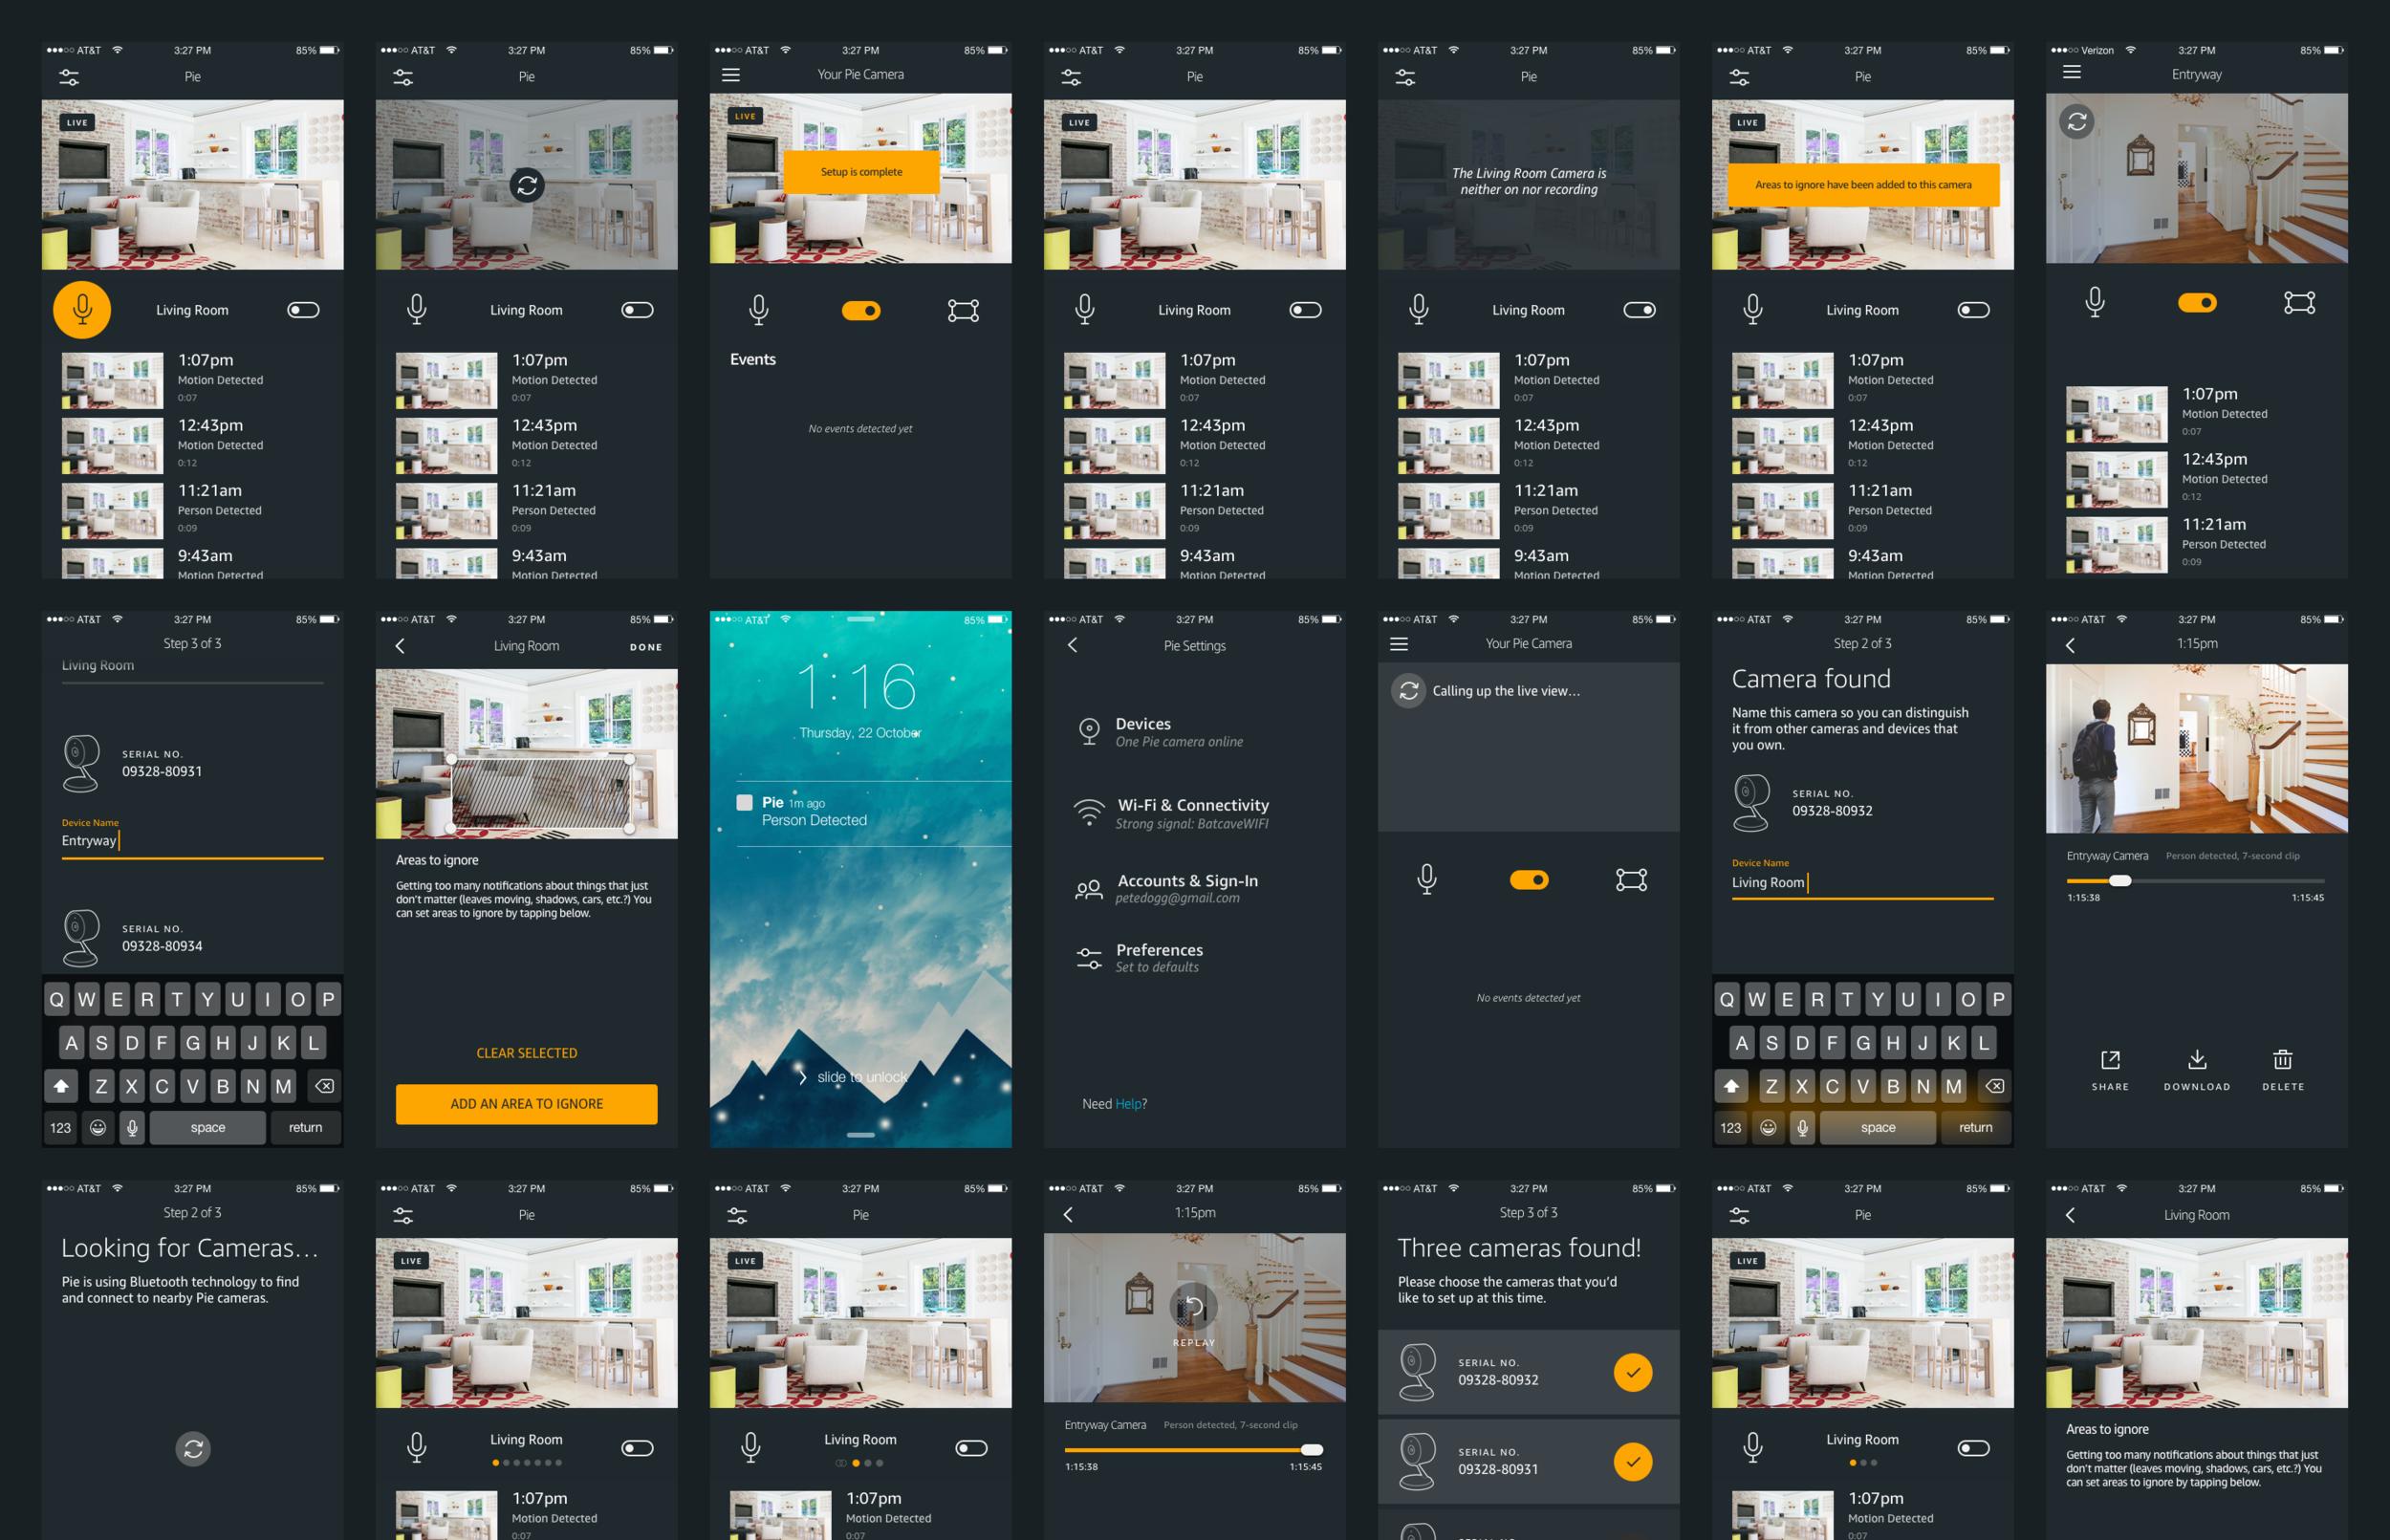 CloudCamera_Screens.png